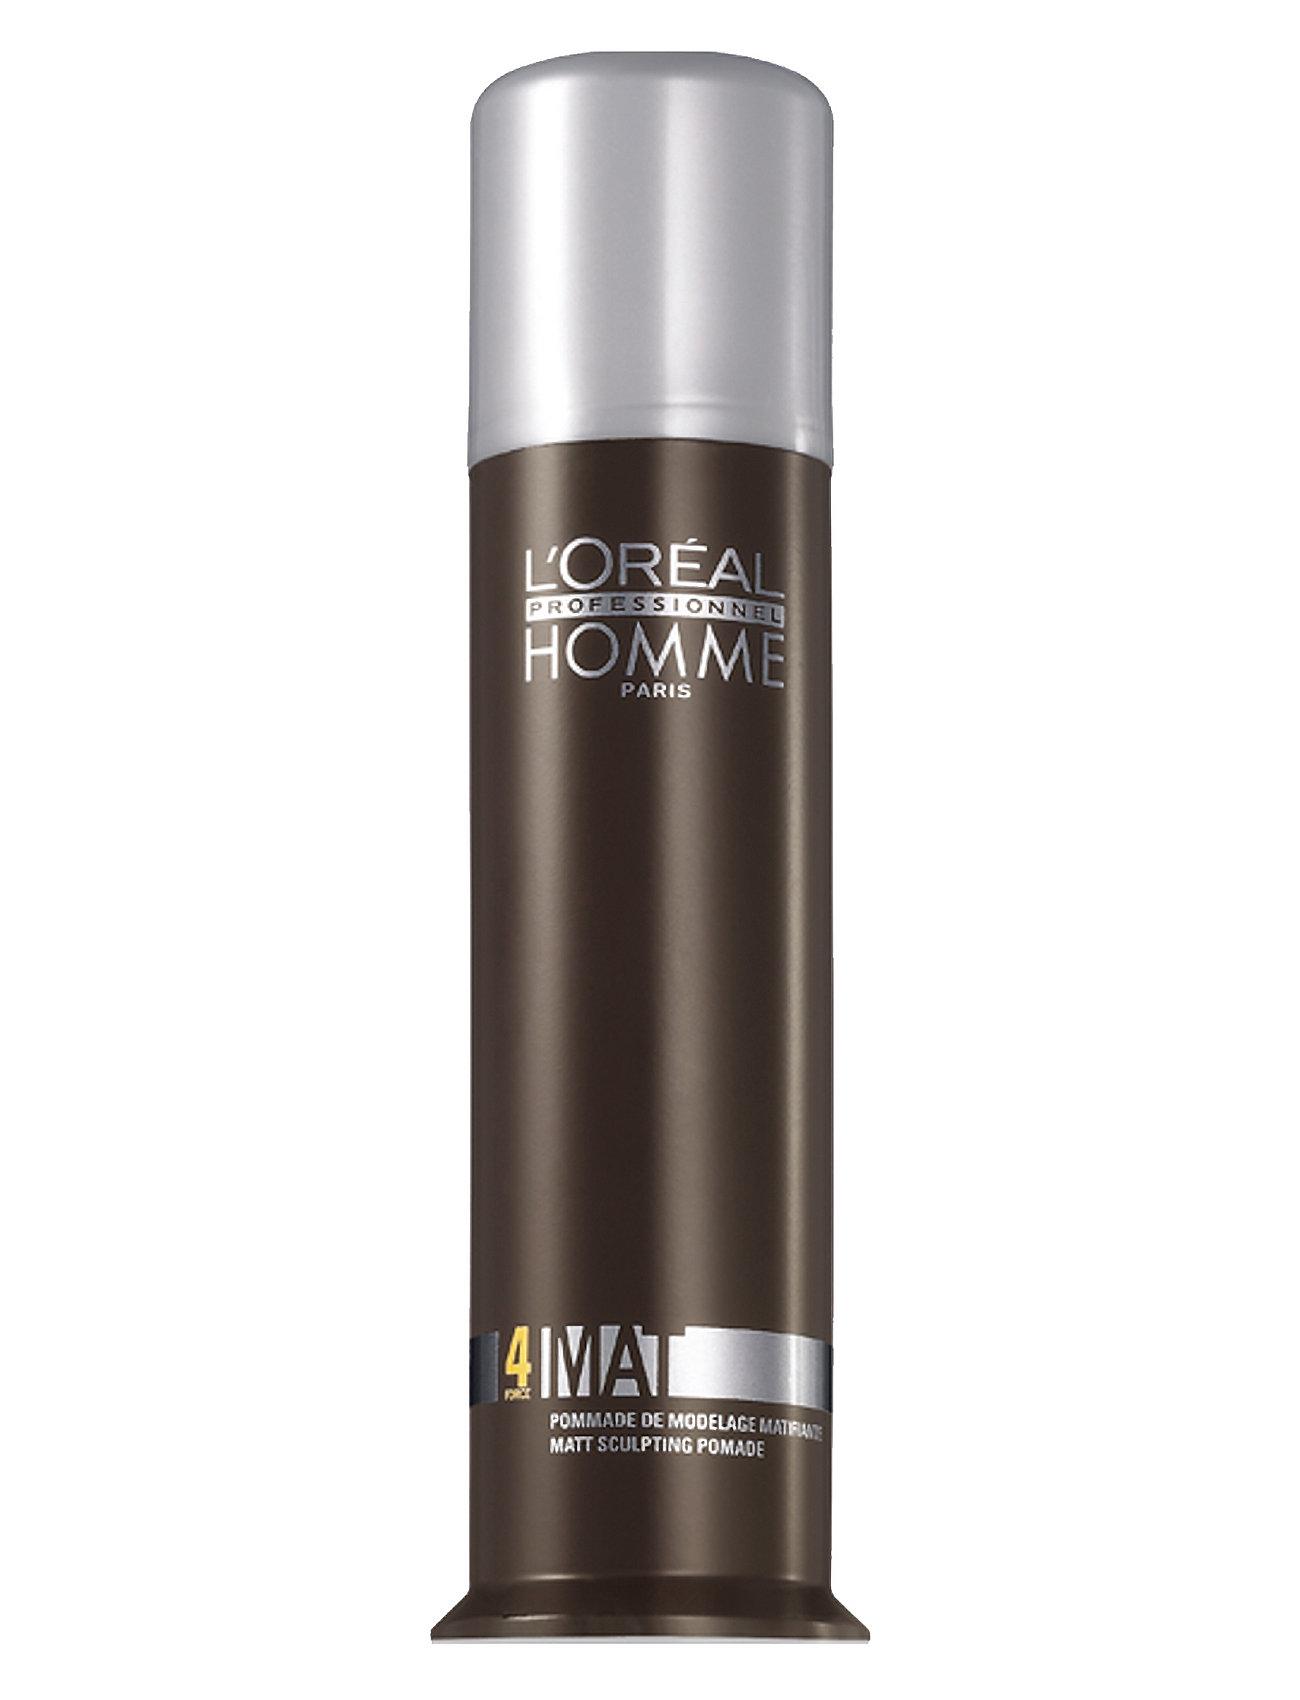 L'Oréal Professionnel L'Oréal Professionnel Homme Mat - CLEAR